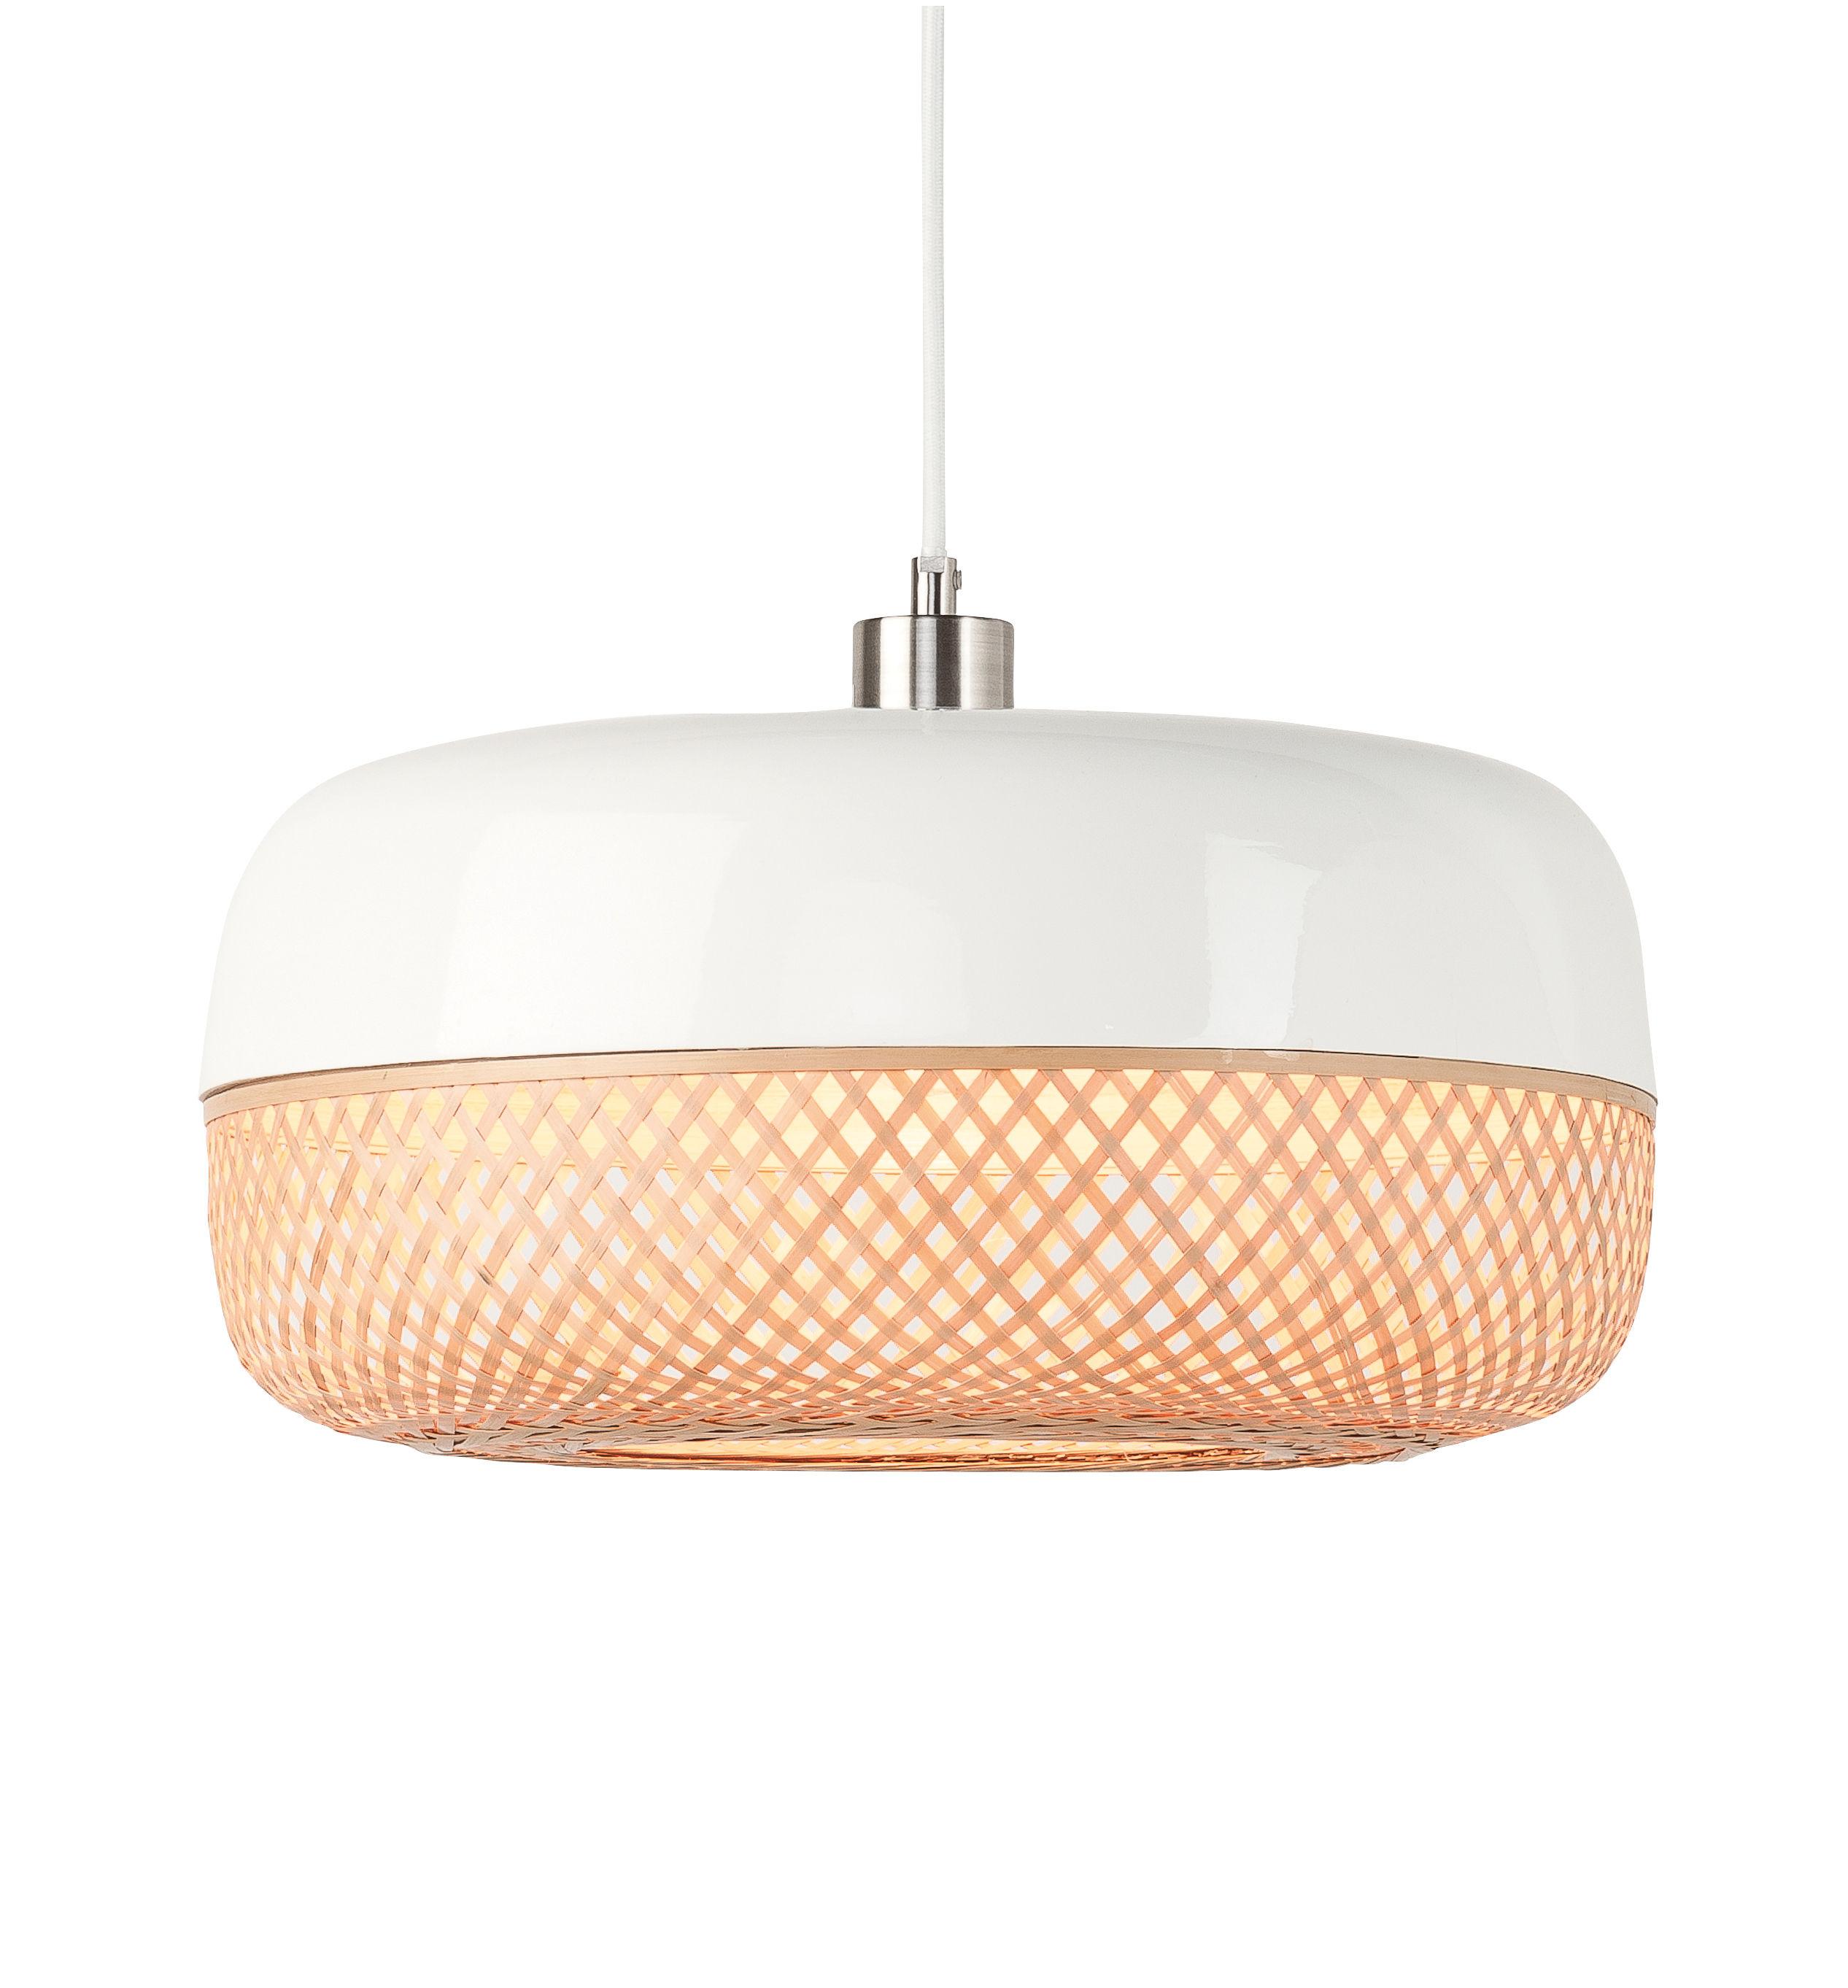 Luminaire - Suspensions - Suspension Mekong / Bambou - Ø 40 x H 22 cm - GOOD&MOJO - Ø 40xH 22 cm / Bambou & blanc - Bambou peint, Banbou naturel tressé